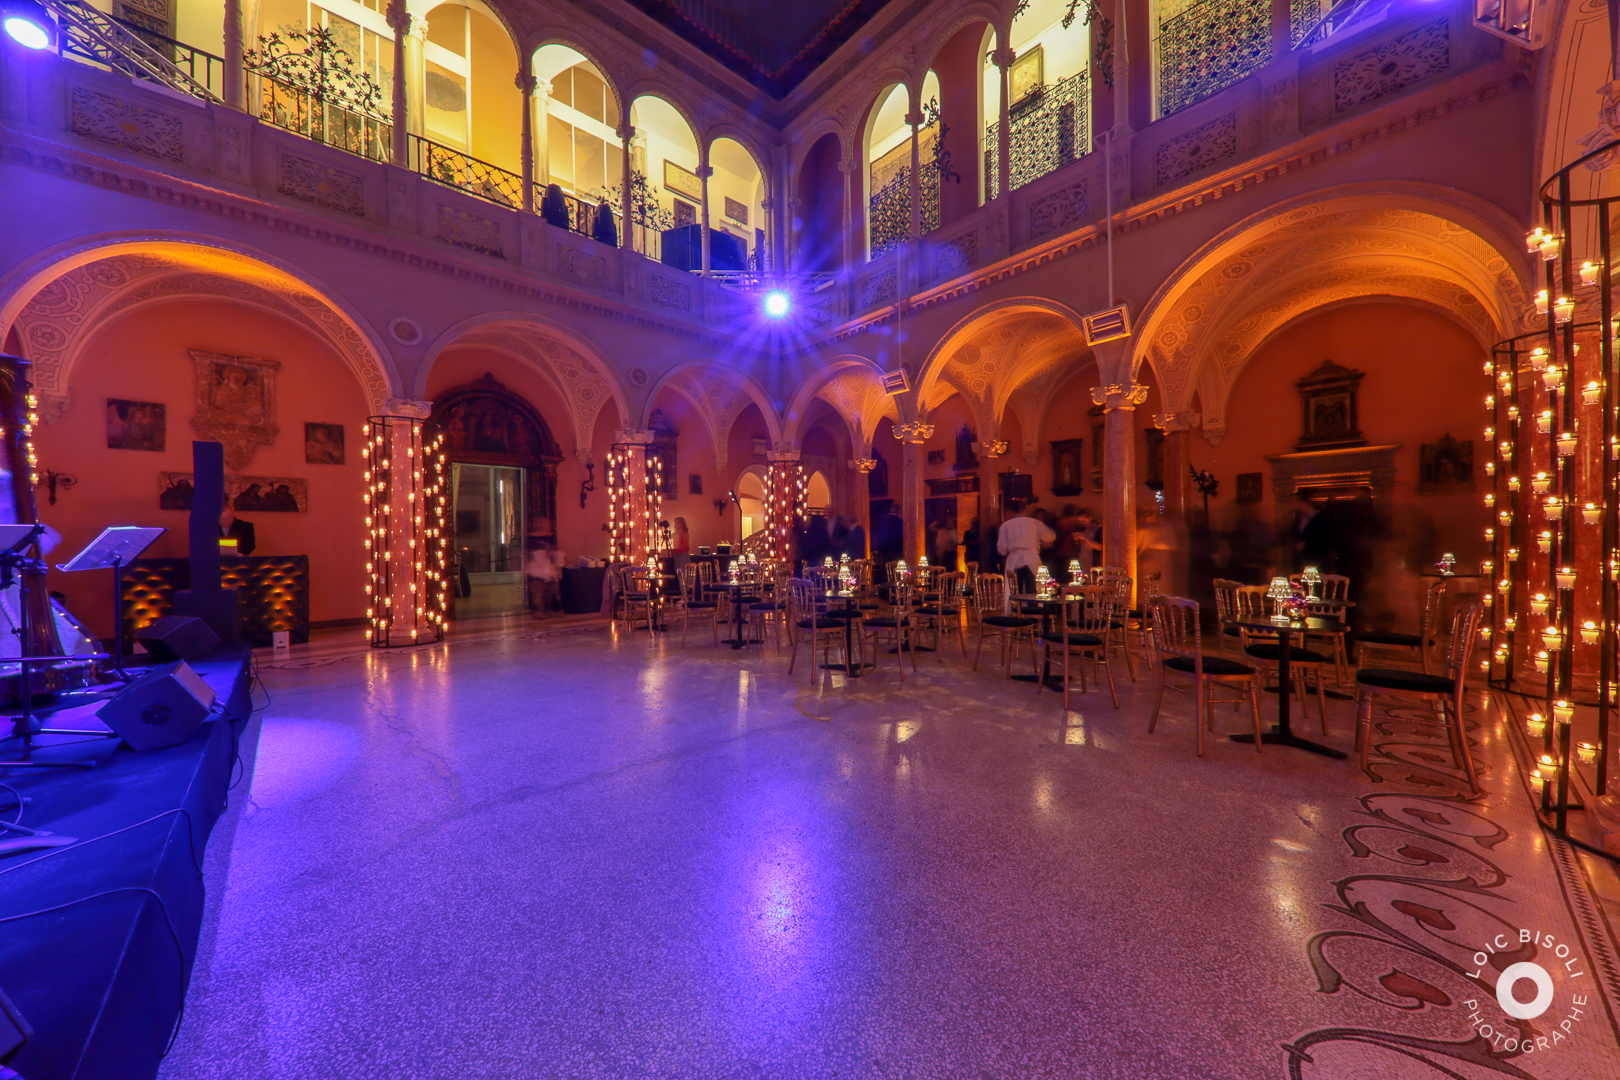 aucop-Villa Ephrussi de Rothschild-Studio Loic Bisoli-facade-nice-soiree-saint jean cap ferrat-evenement-lumieres